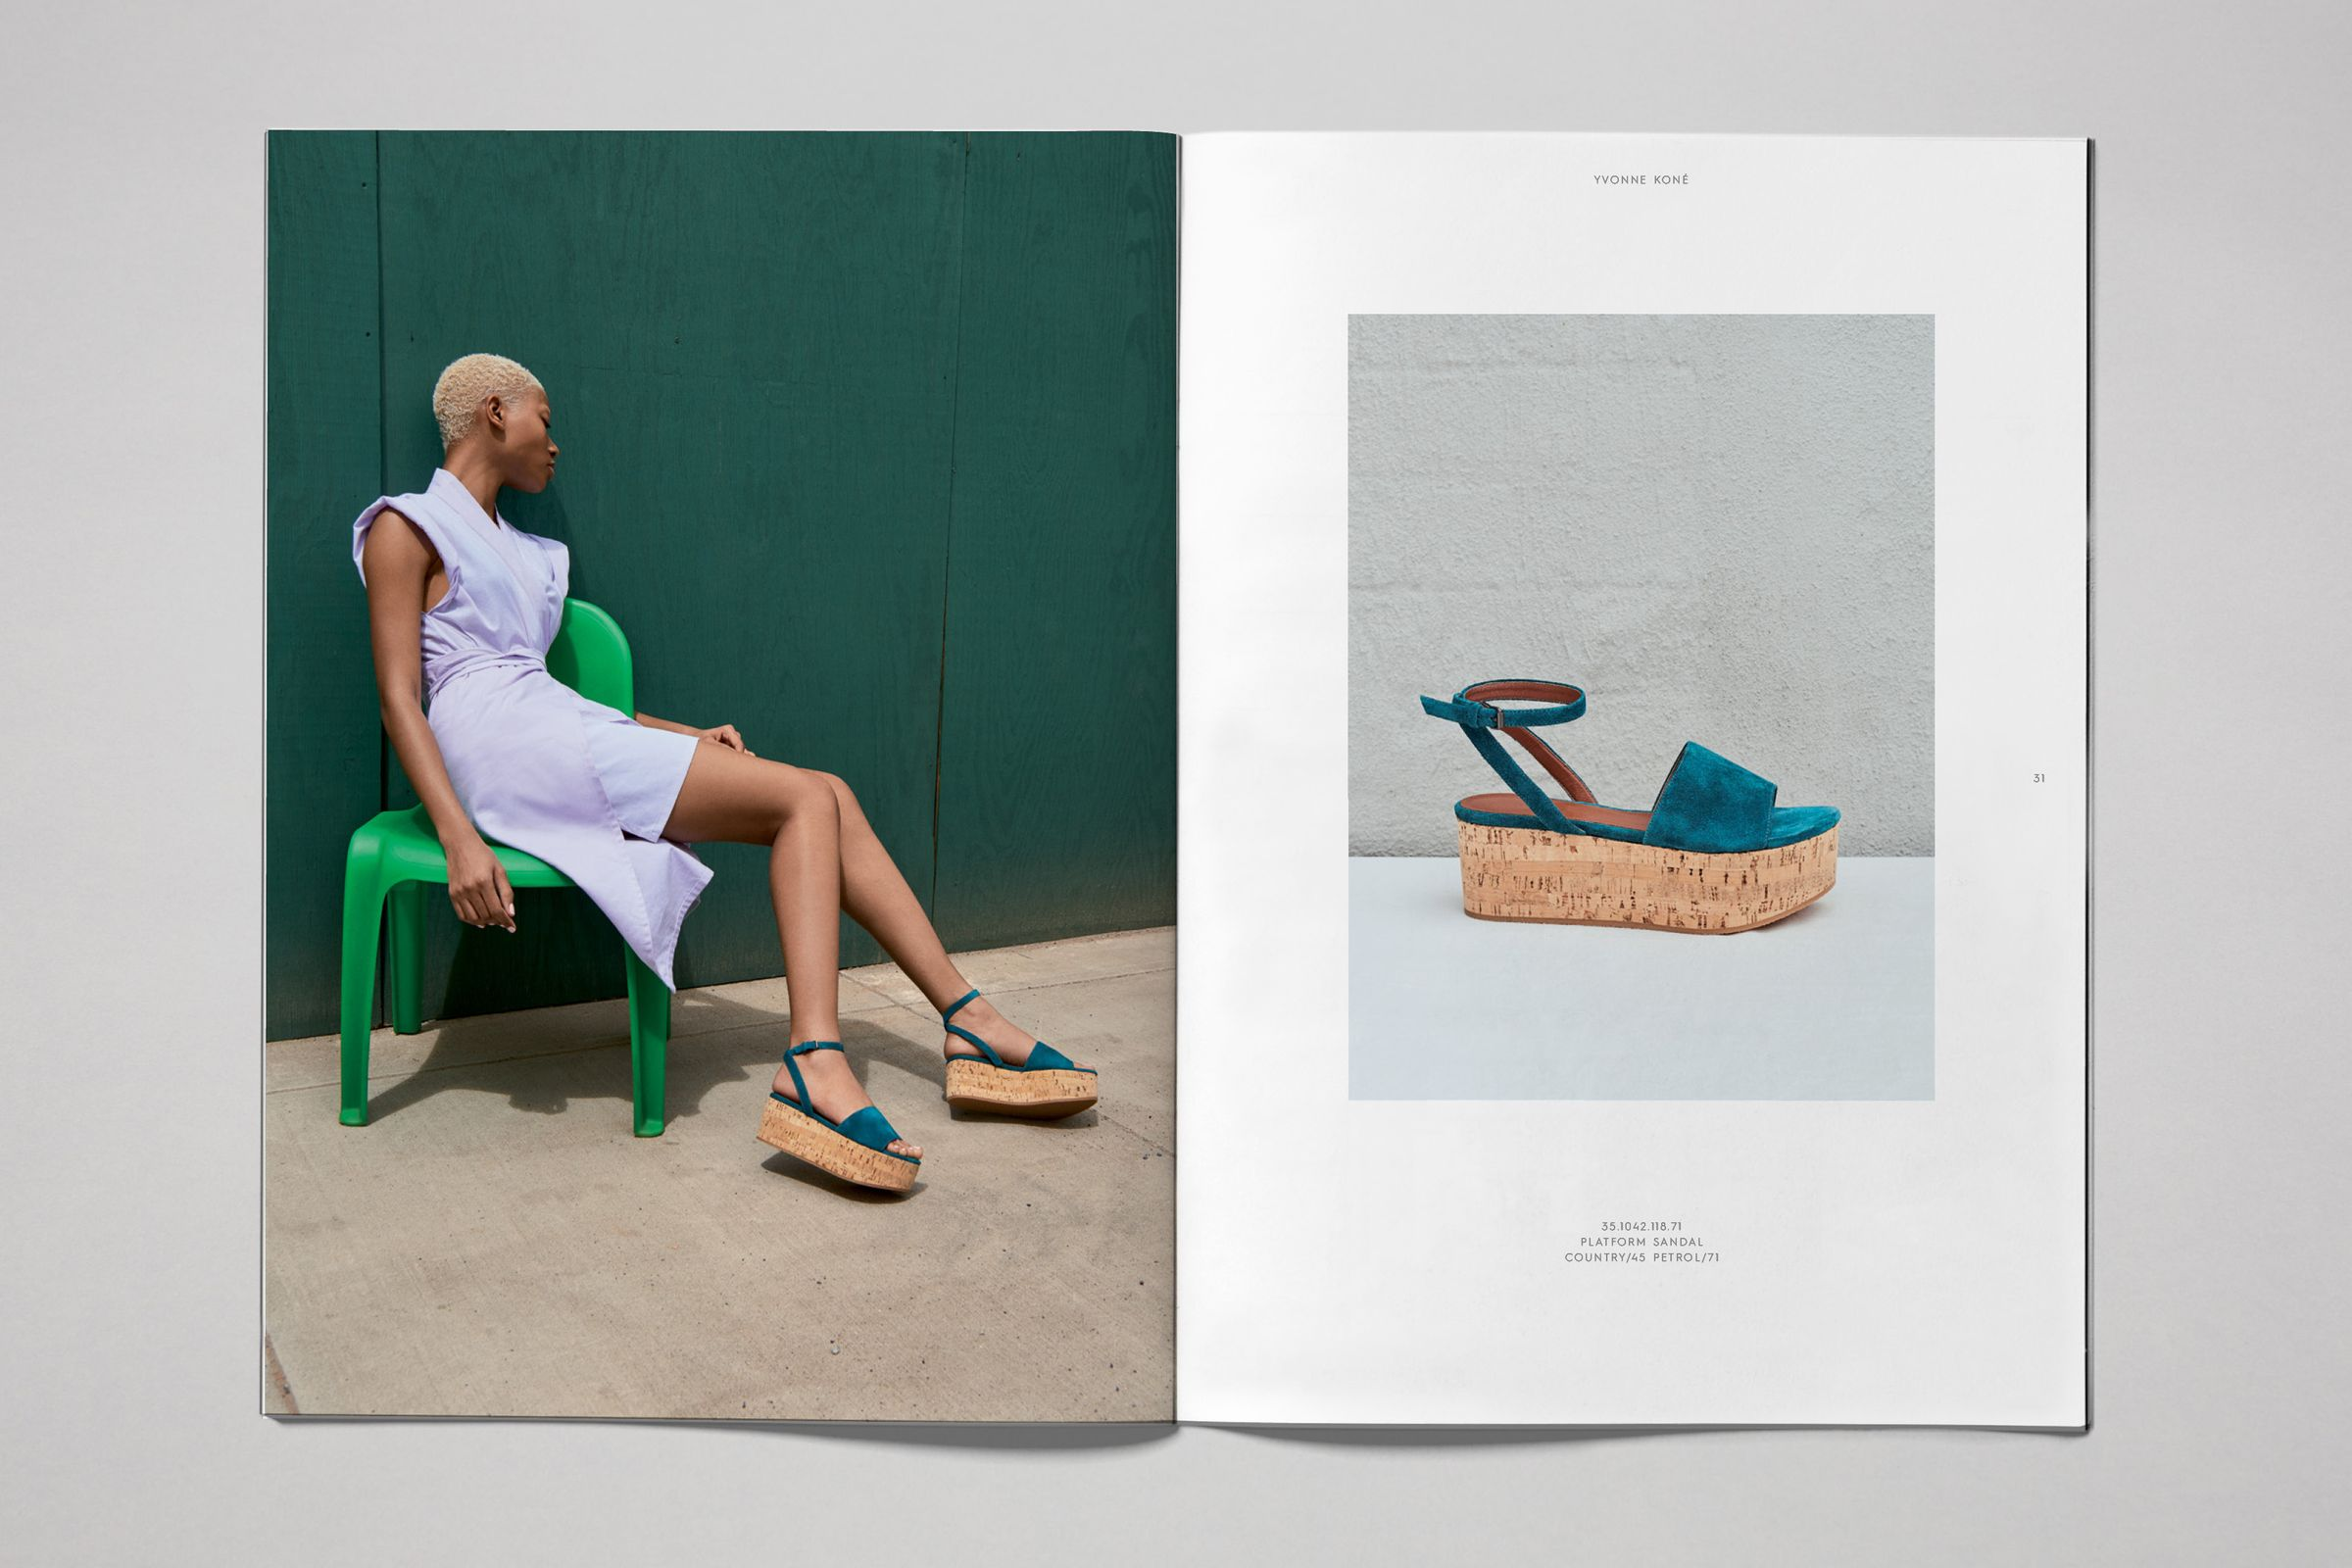 Yvonne Kone catalog layout design with platform sandals